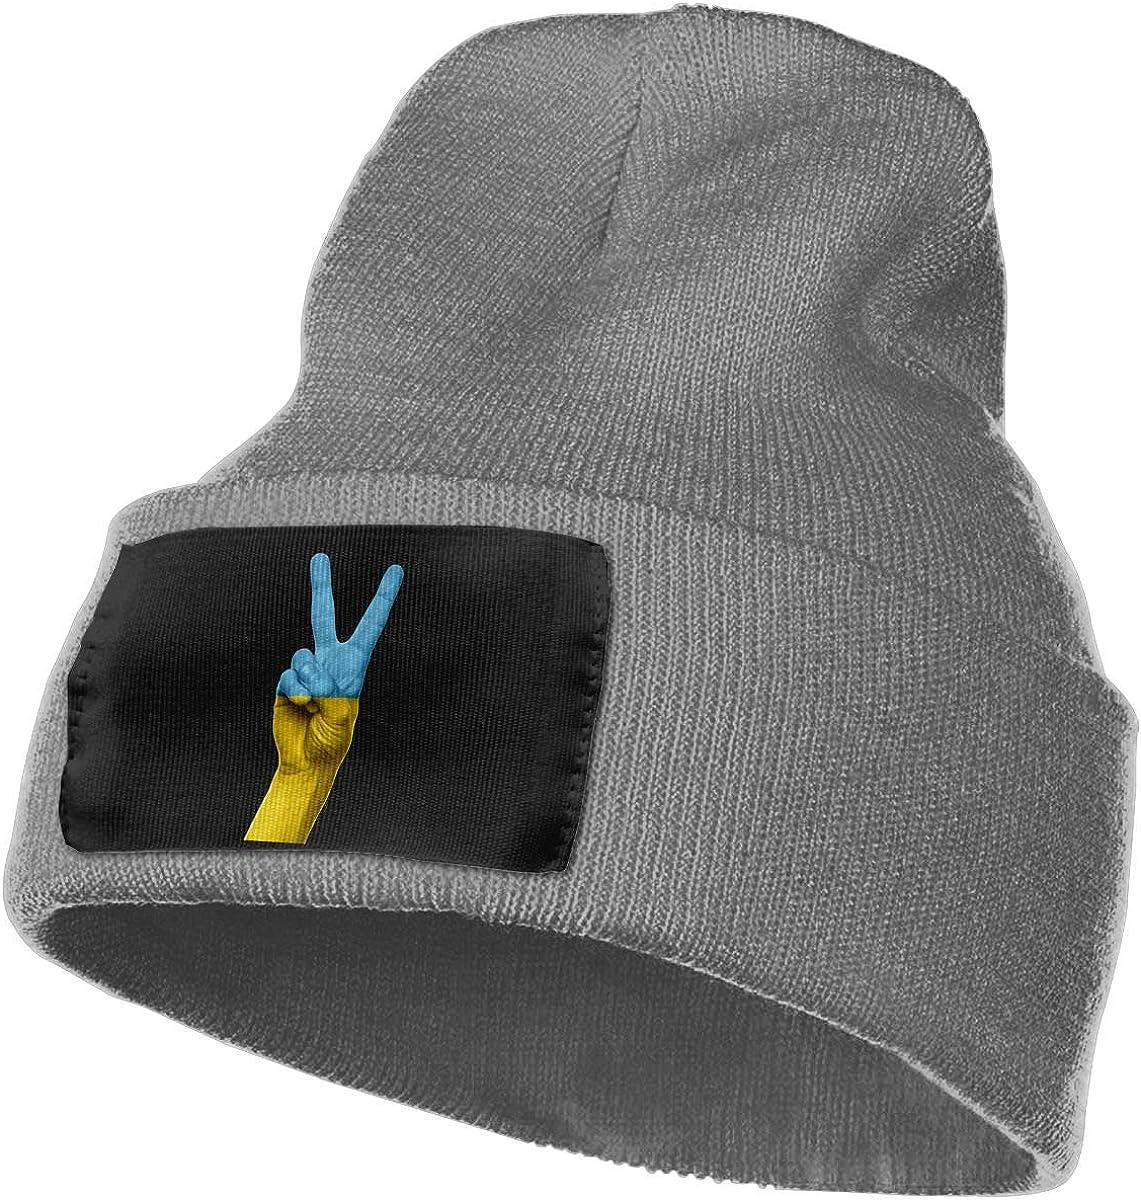 SLADDD1 Ukraine Warm Winter Hat Knit Beanie Skull Cap Cuff Beanie Hat Winter Hats for Men /& Women